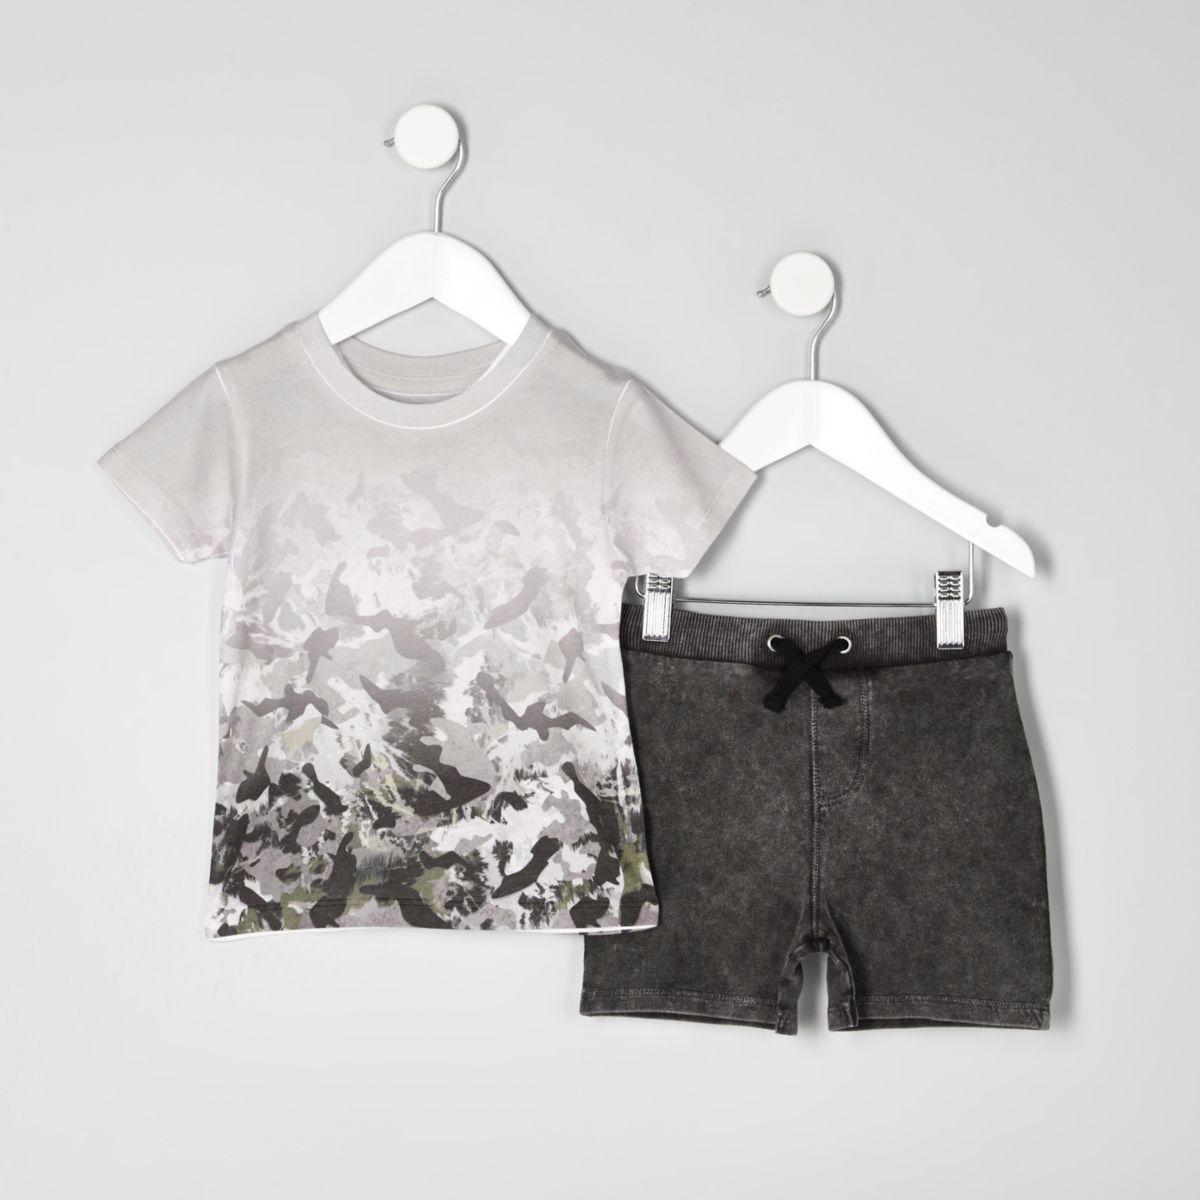 Mini boys cream camo T-shirt outfit